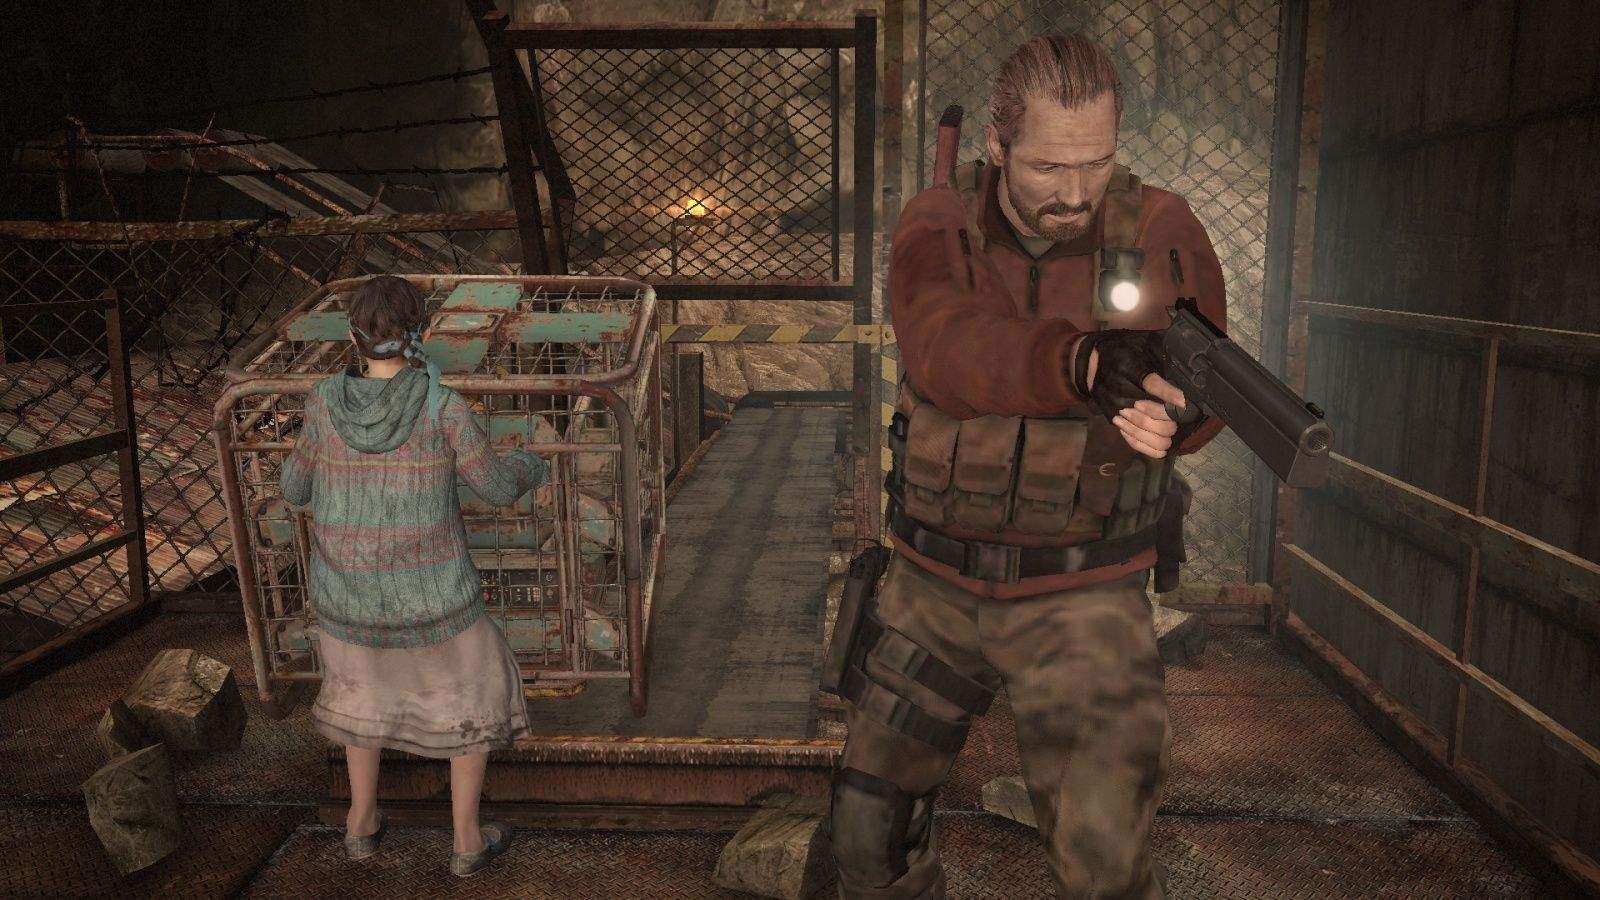 Resident Evil Revelations 2 Squishes Action Horror Together